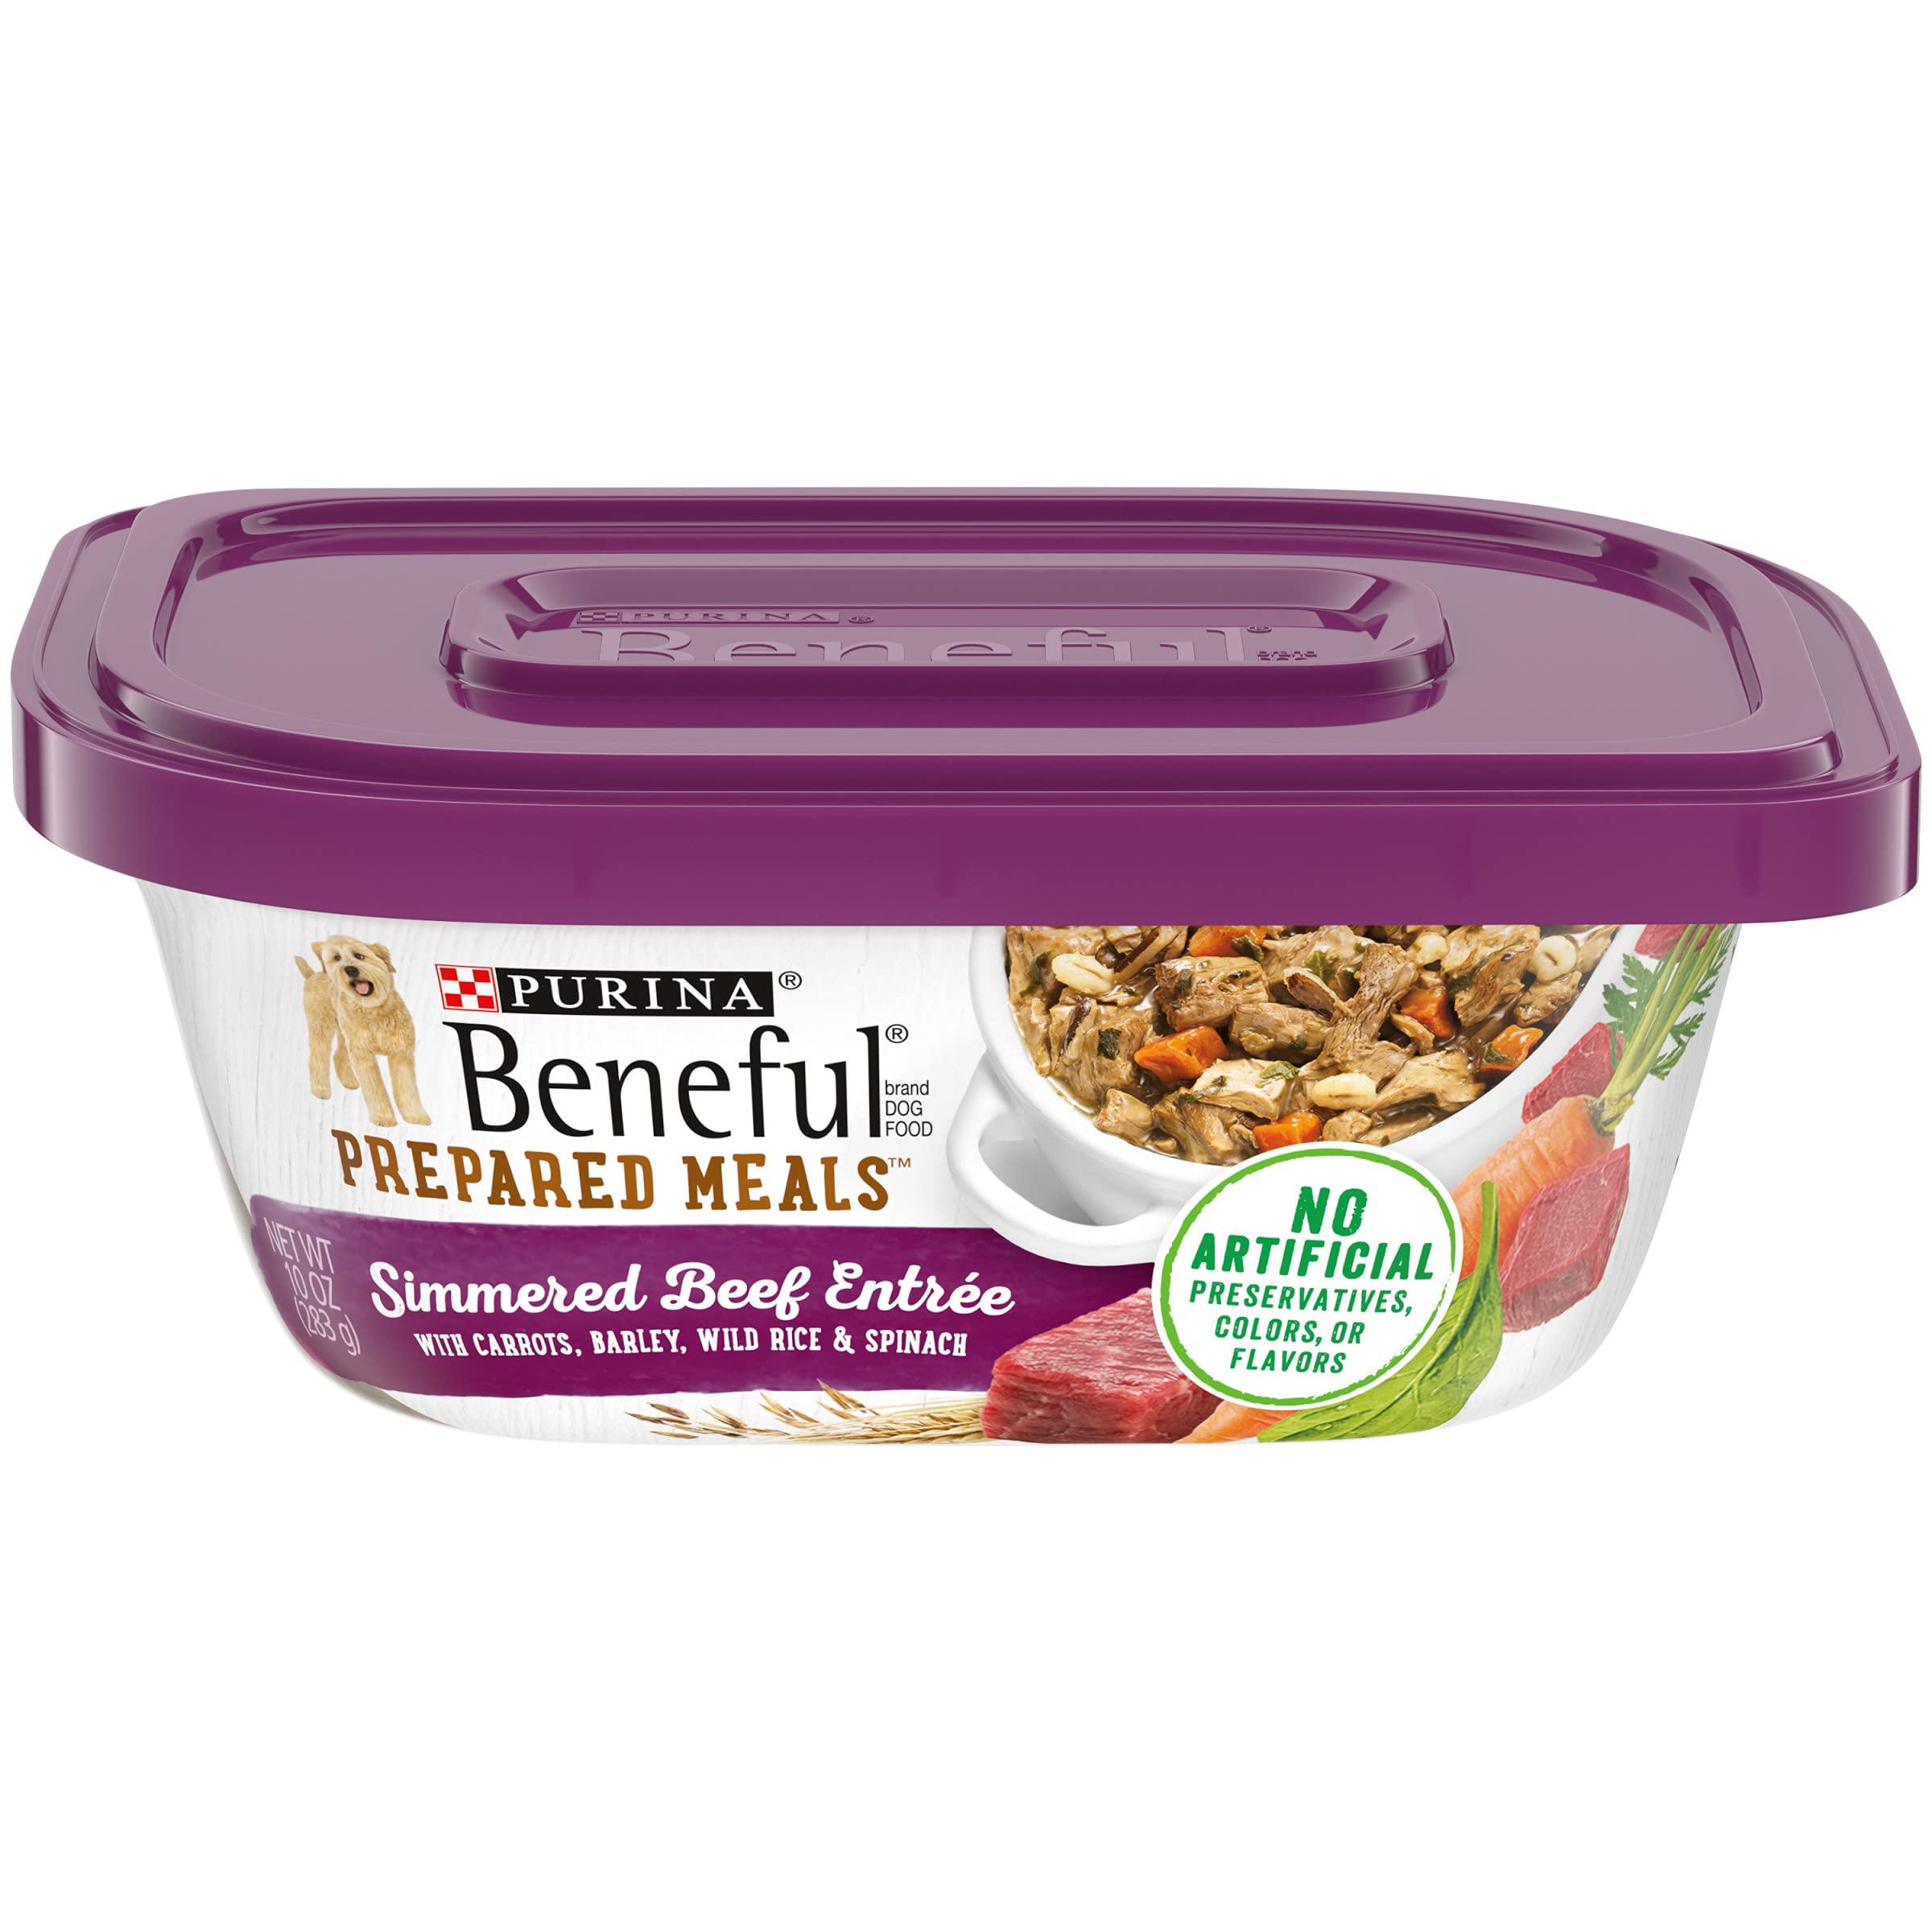 Purina Beneful Prepared Meals Adult Wet Dog Food - (8) 10 oz. Tubs